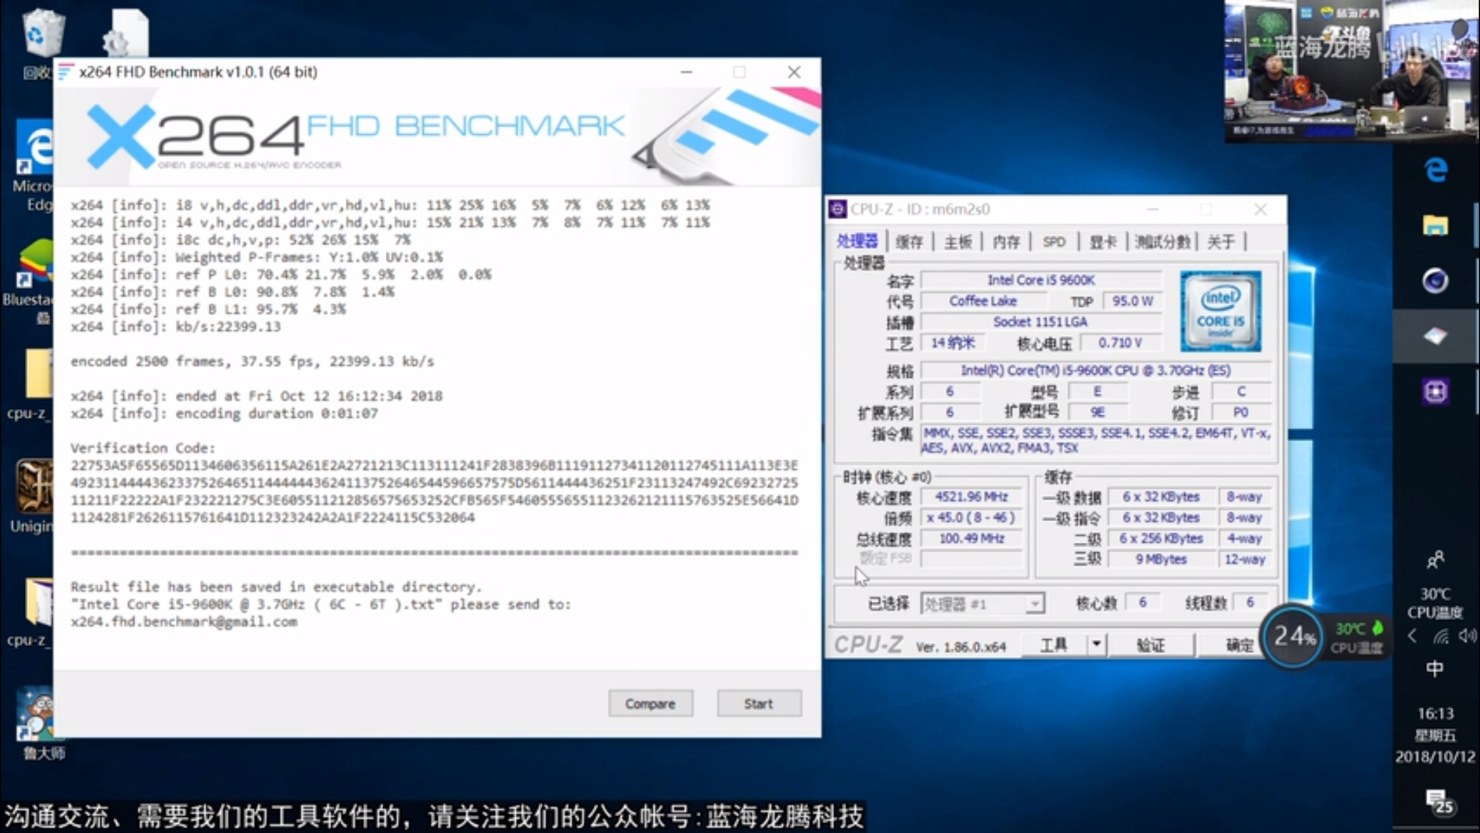 intel-core-i5-9600k-cpu-benchmarks_5